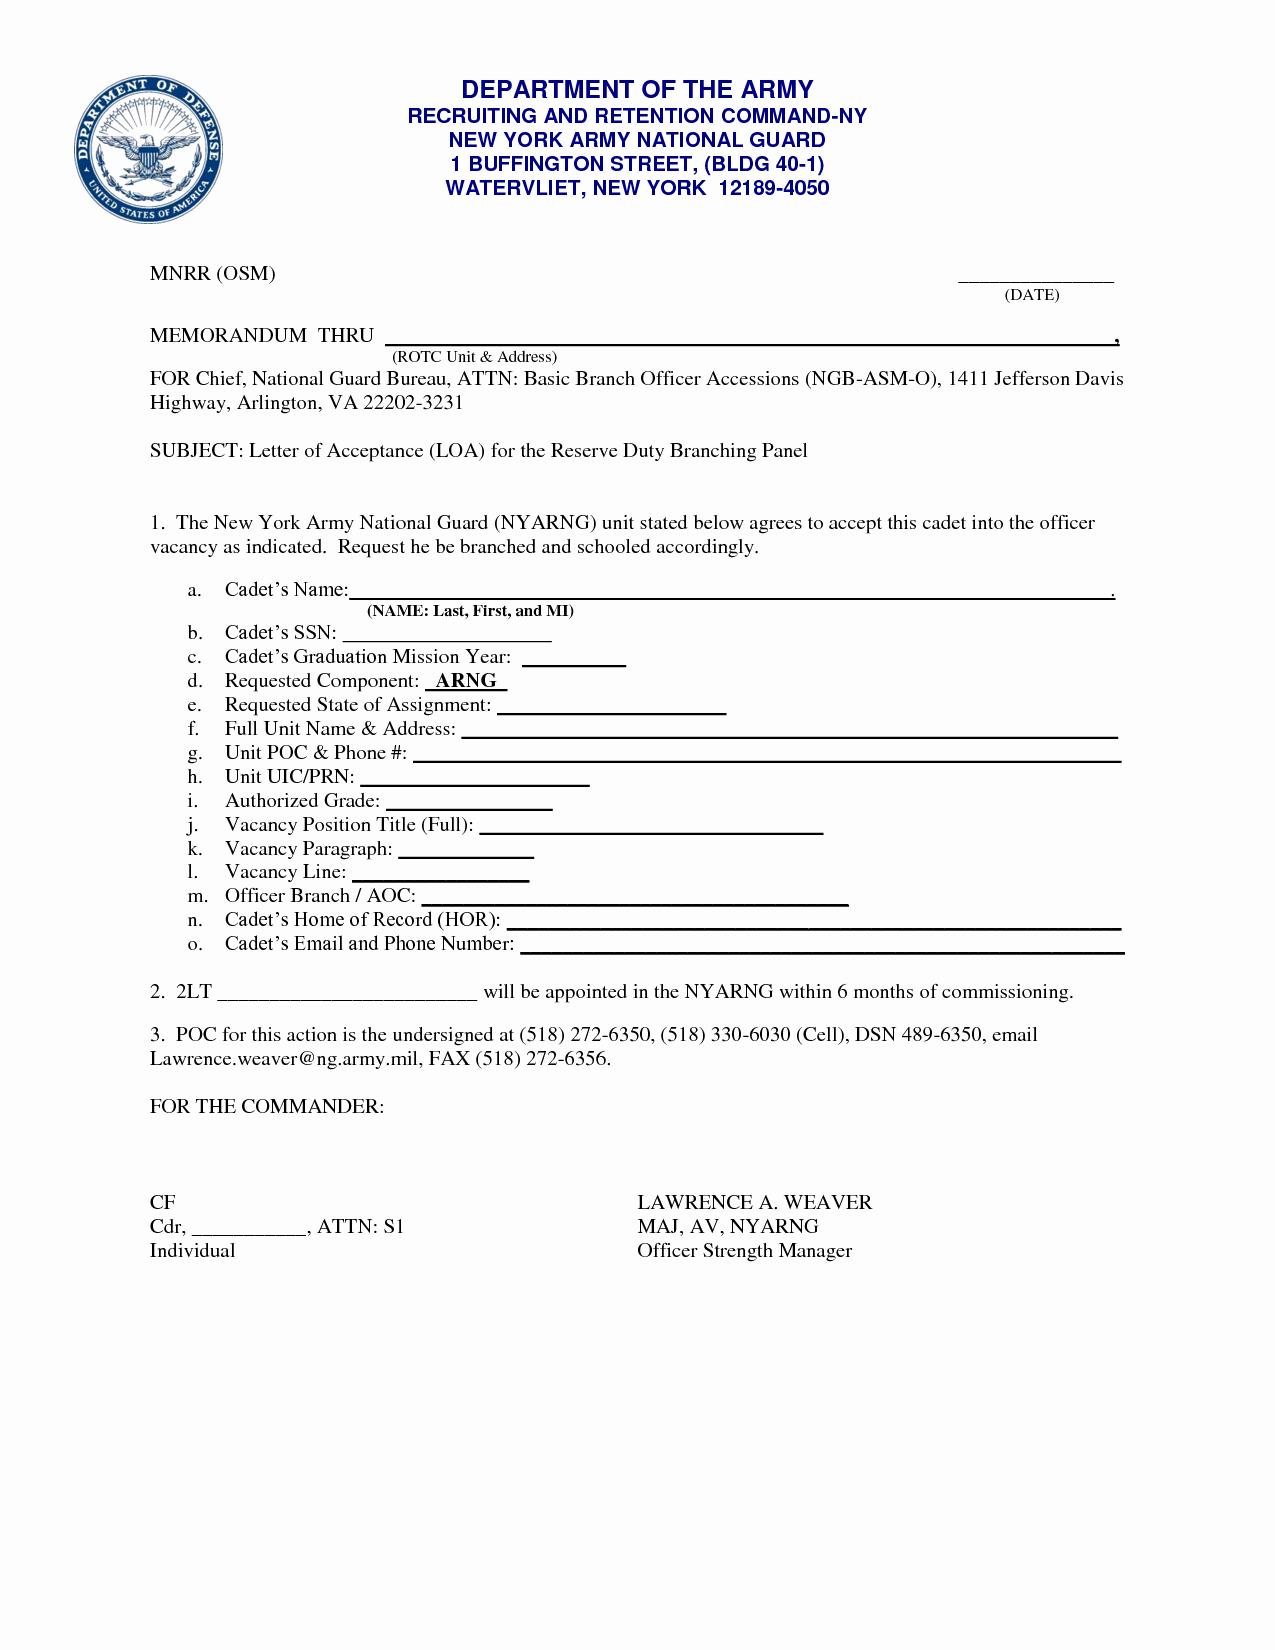 Army Memorandum for Record Template Unique Best S Of Army Memorandum Template Army Memorandum